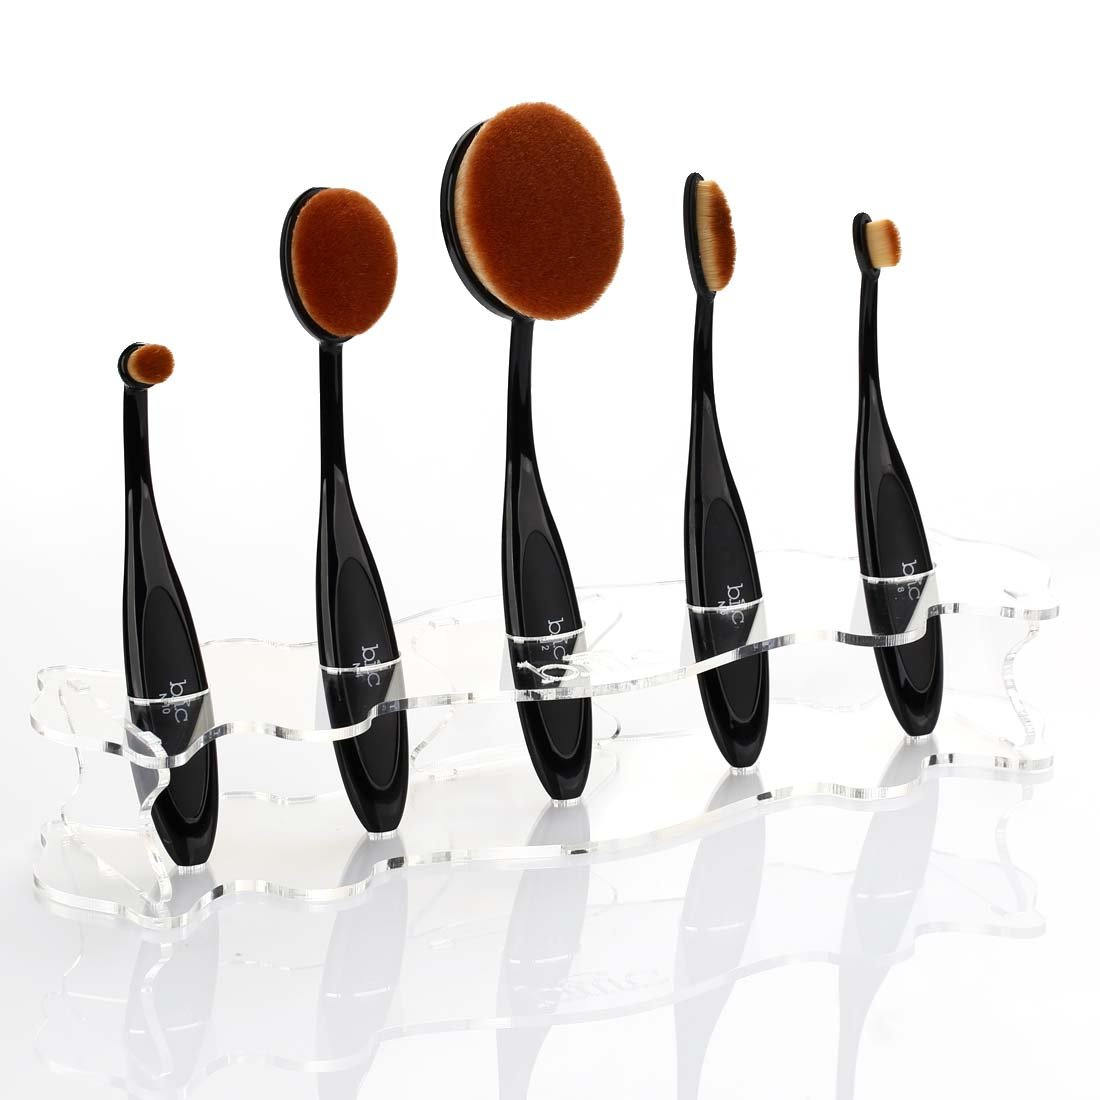 BMC Clear Acrylic 5 Slot Luminous Perfecting Curve Makeup Brush Holder Stand